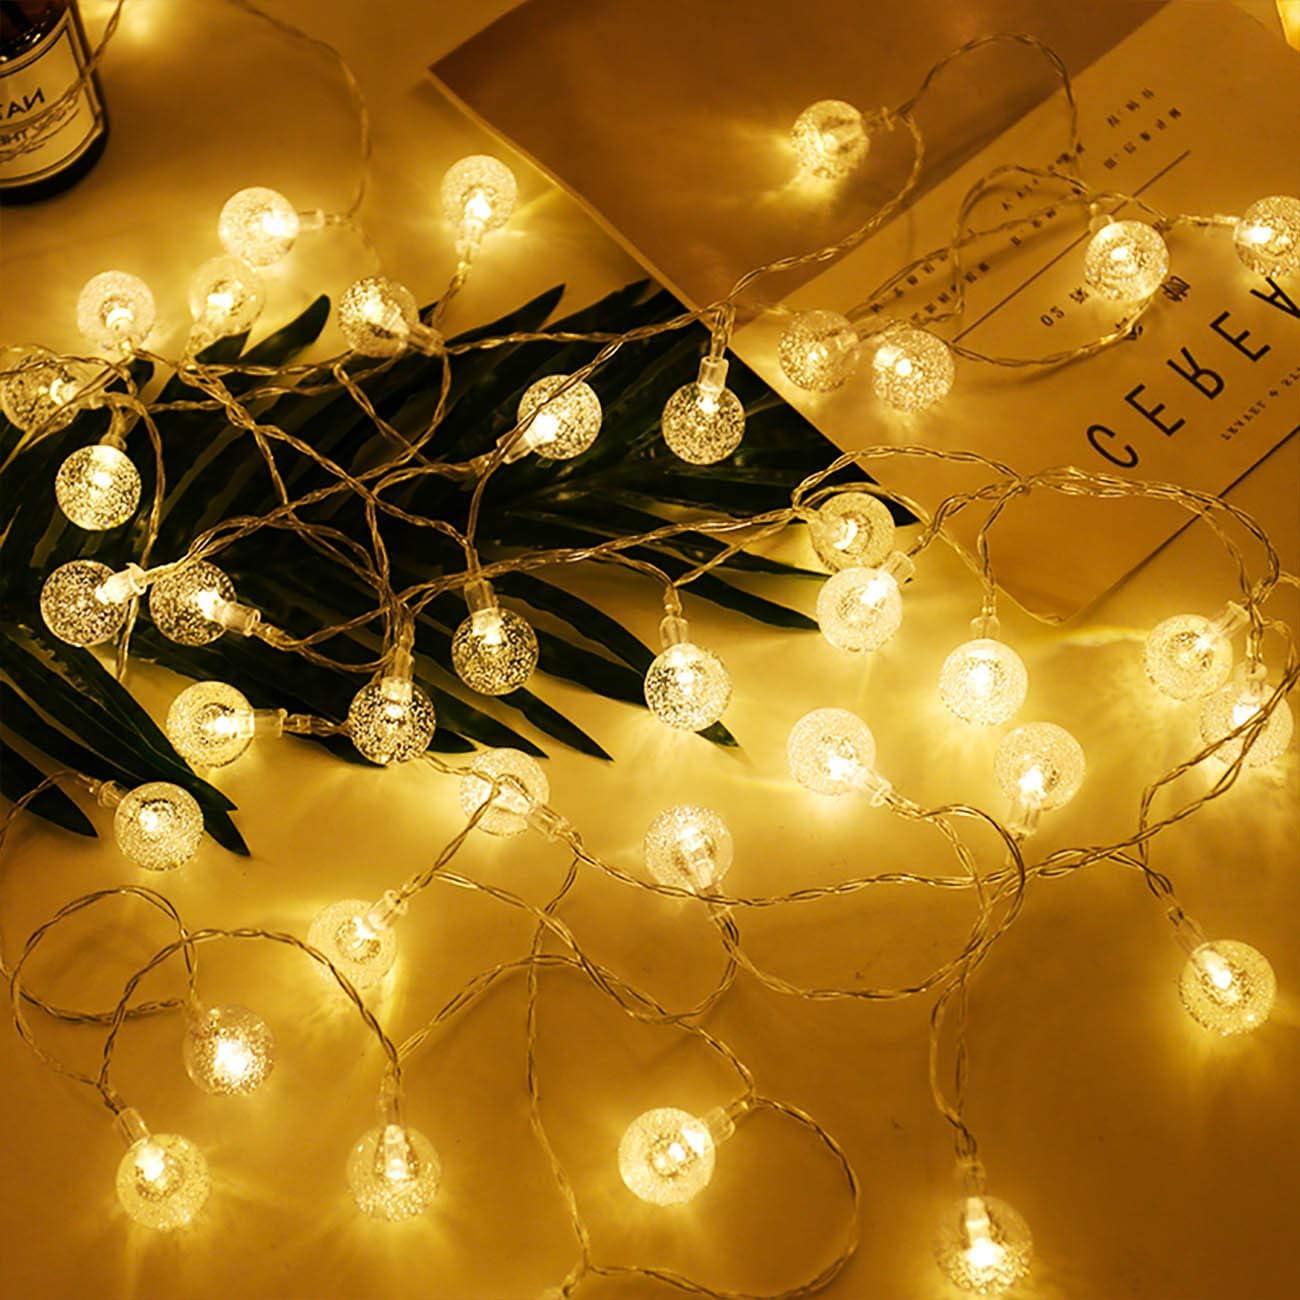 Guirnalda Luces Pilas [2 Pack], Litogo 4m 20 LED Bola de Cristal Luces LED Pilas, Guirnalda Bombillas Cadena de Luces Decoracion para Navidad Terraza Hogar Jardín Arboles Patio Bodas Fiesta Interior: Amazon.es: